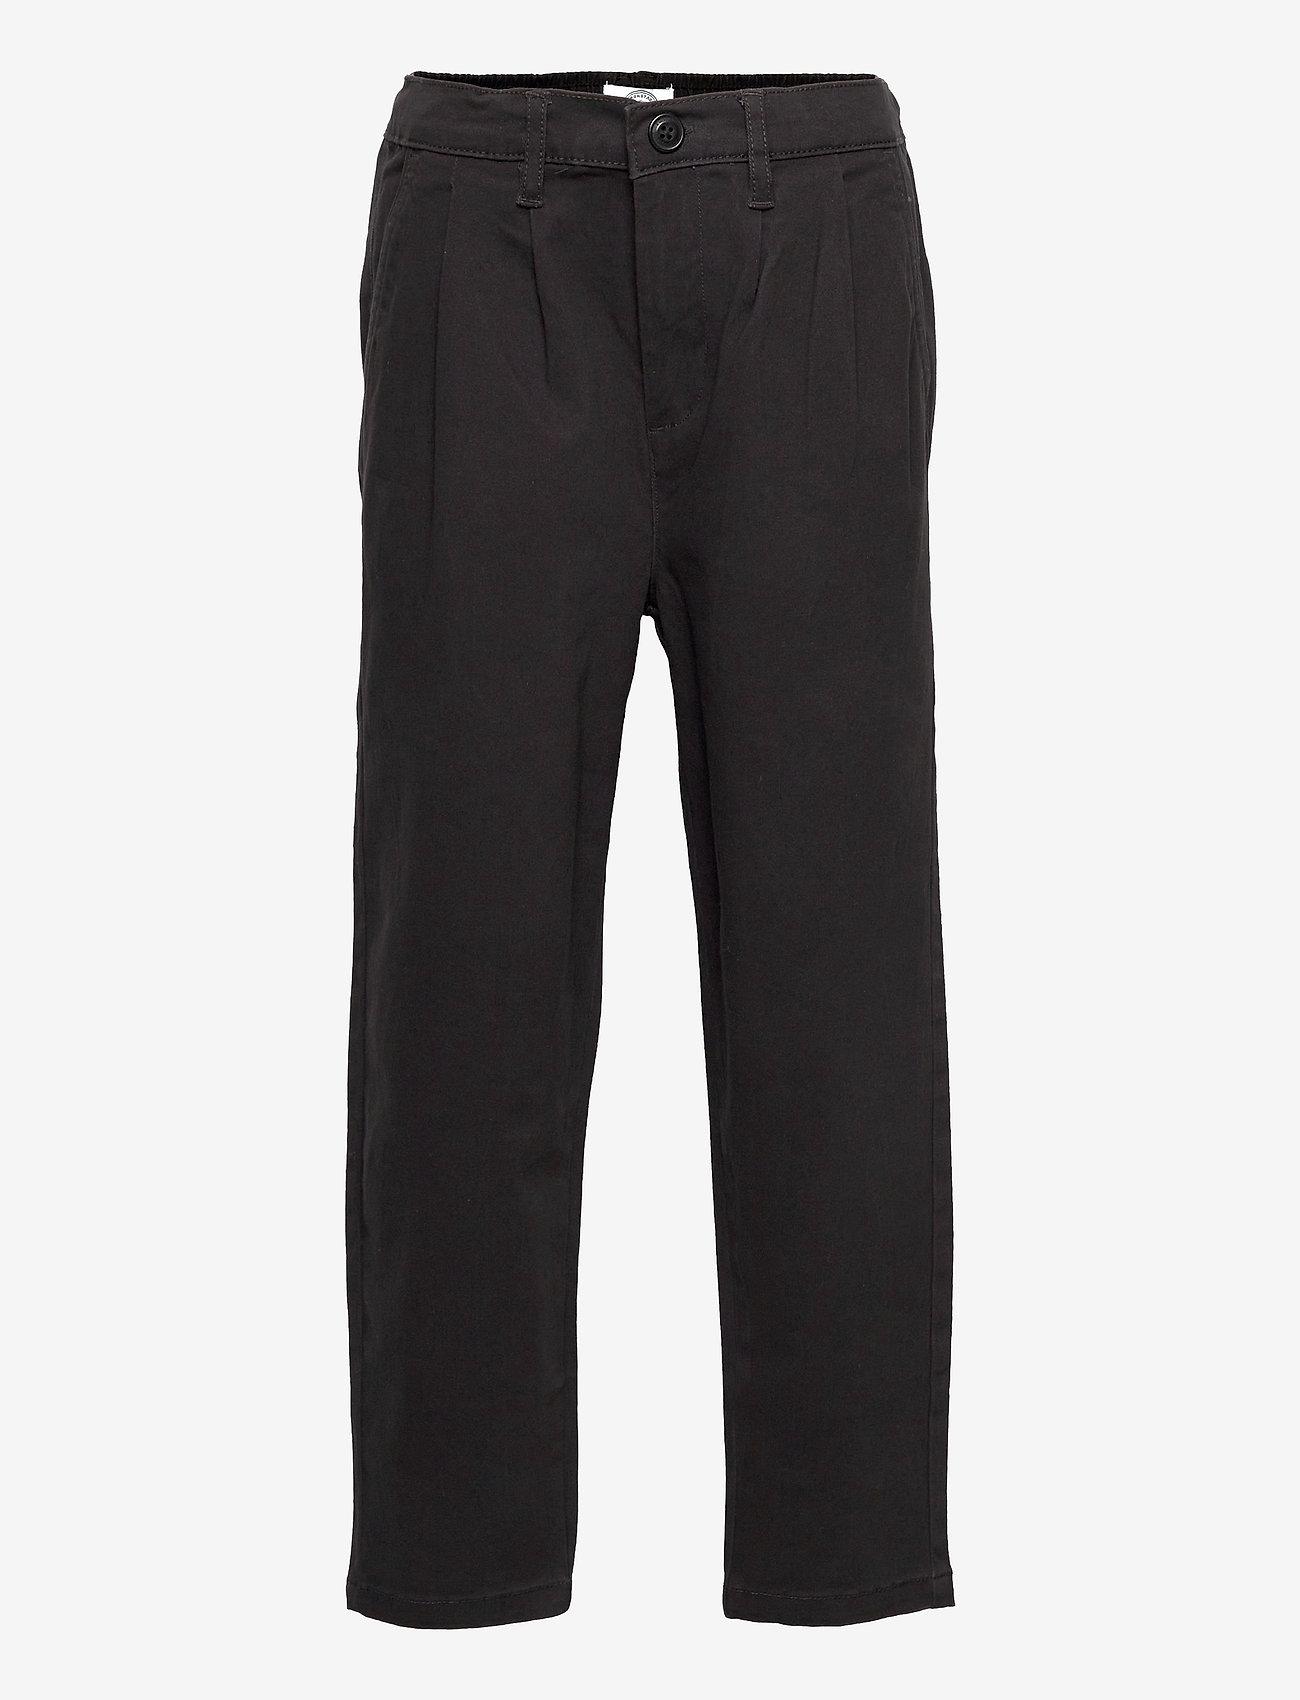 Kronstadt - Mason - trousers - black - 0